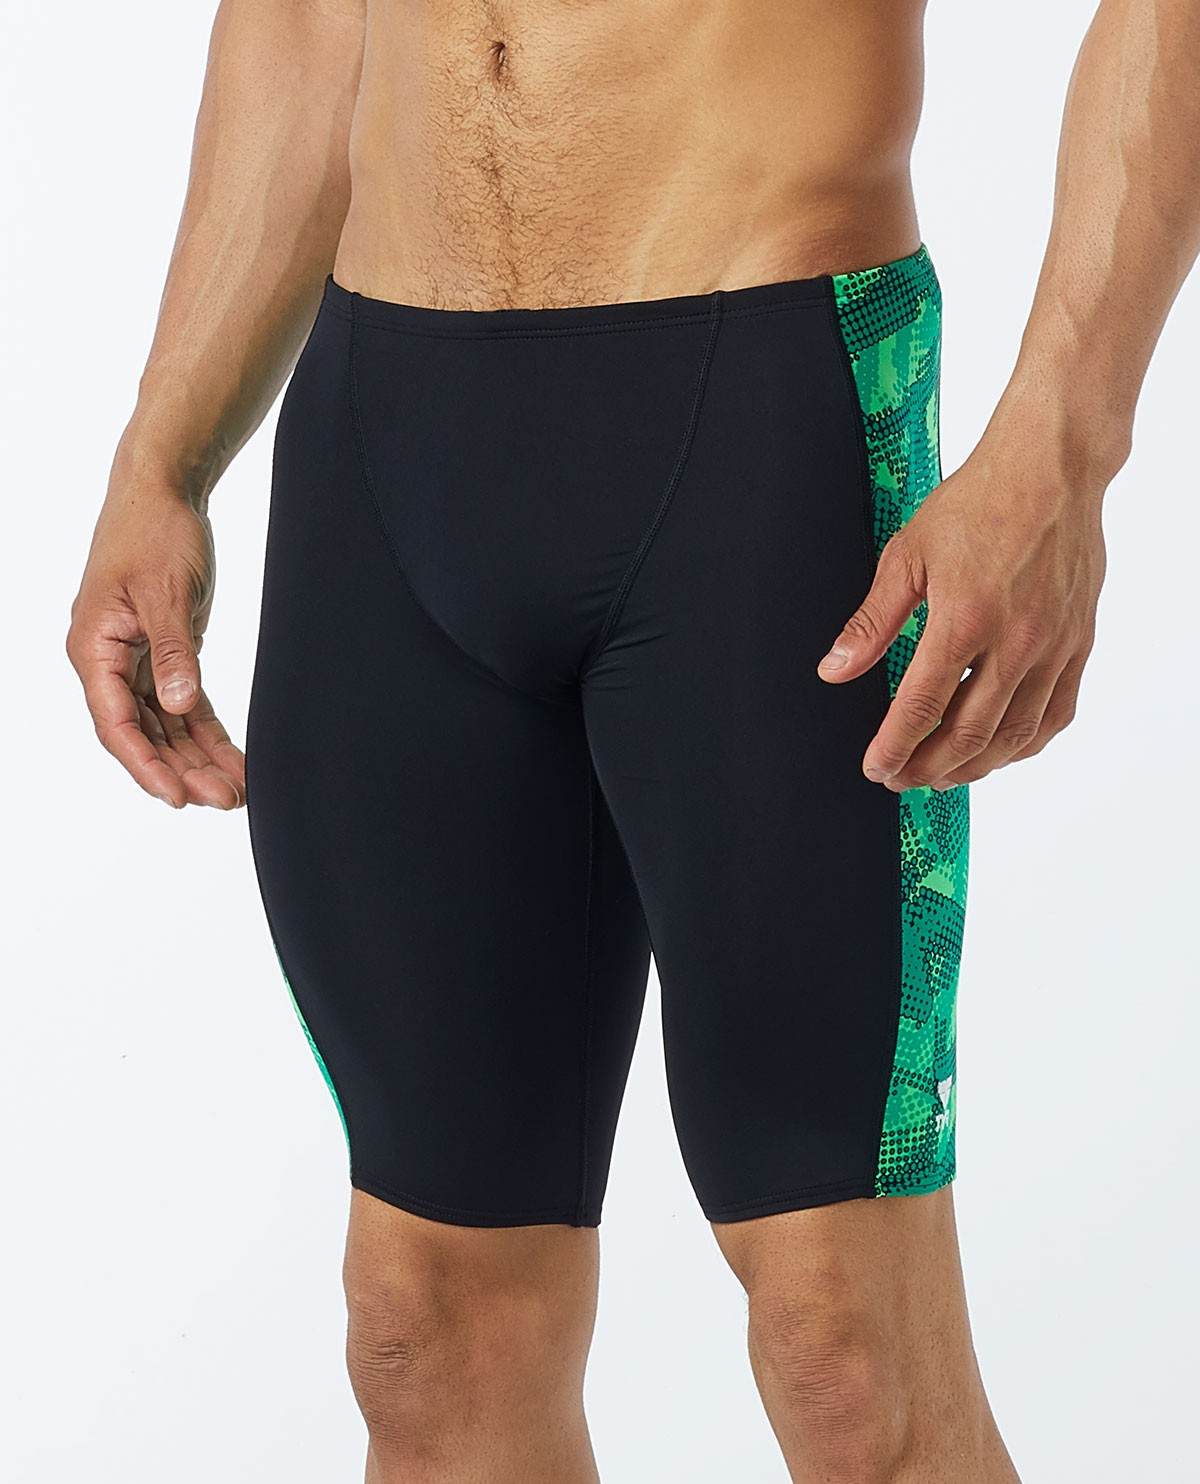 628b4f6ebb TYR Men's Vesuvius Hero Splice Jammer Swimsuit | TYR